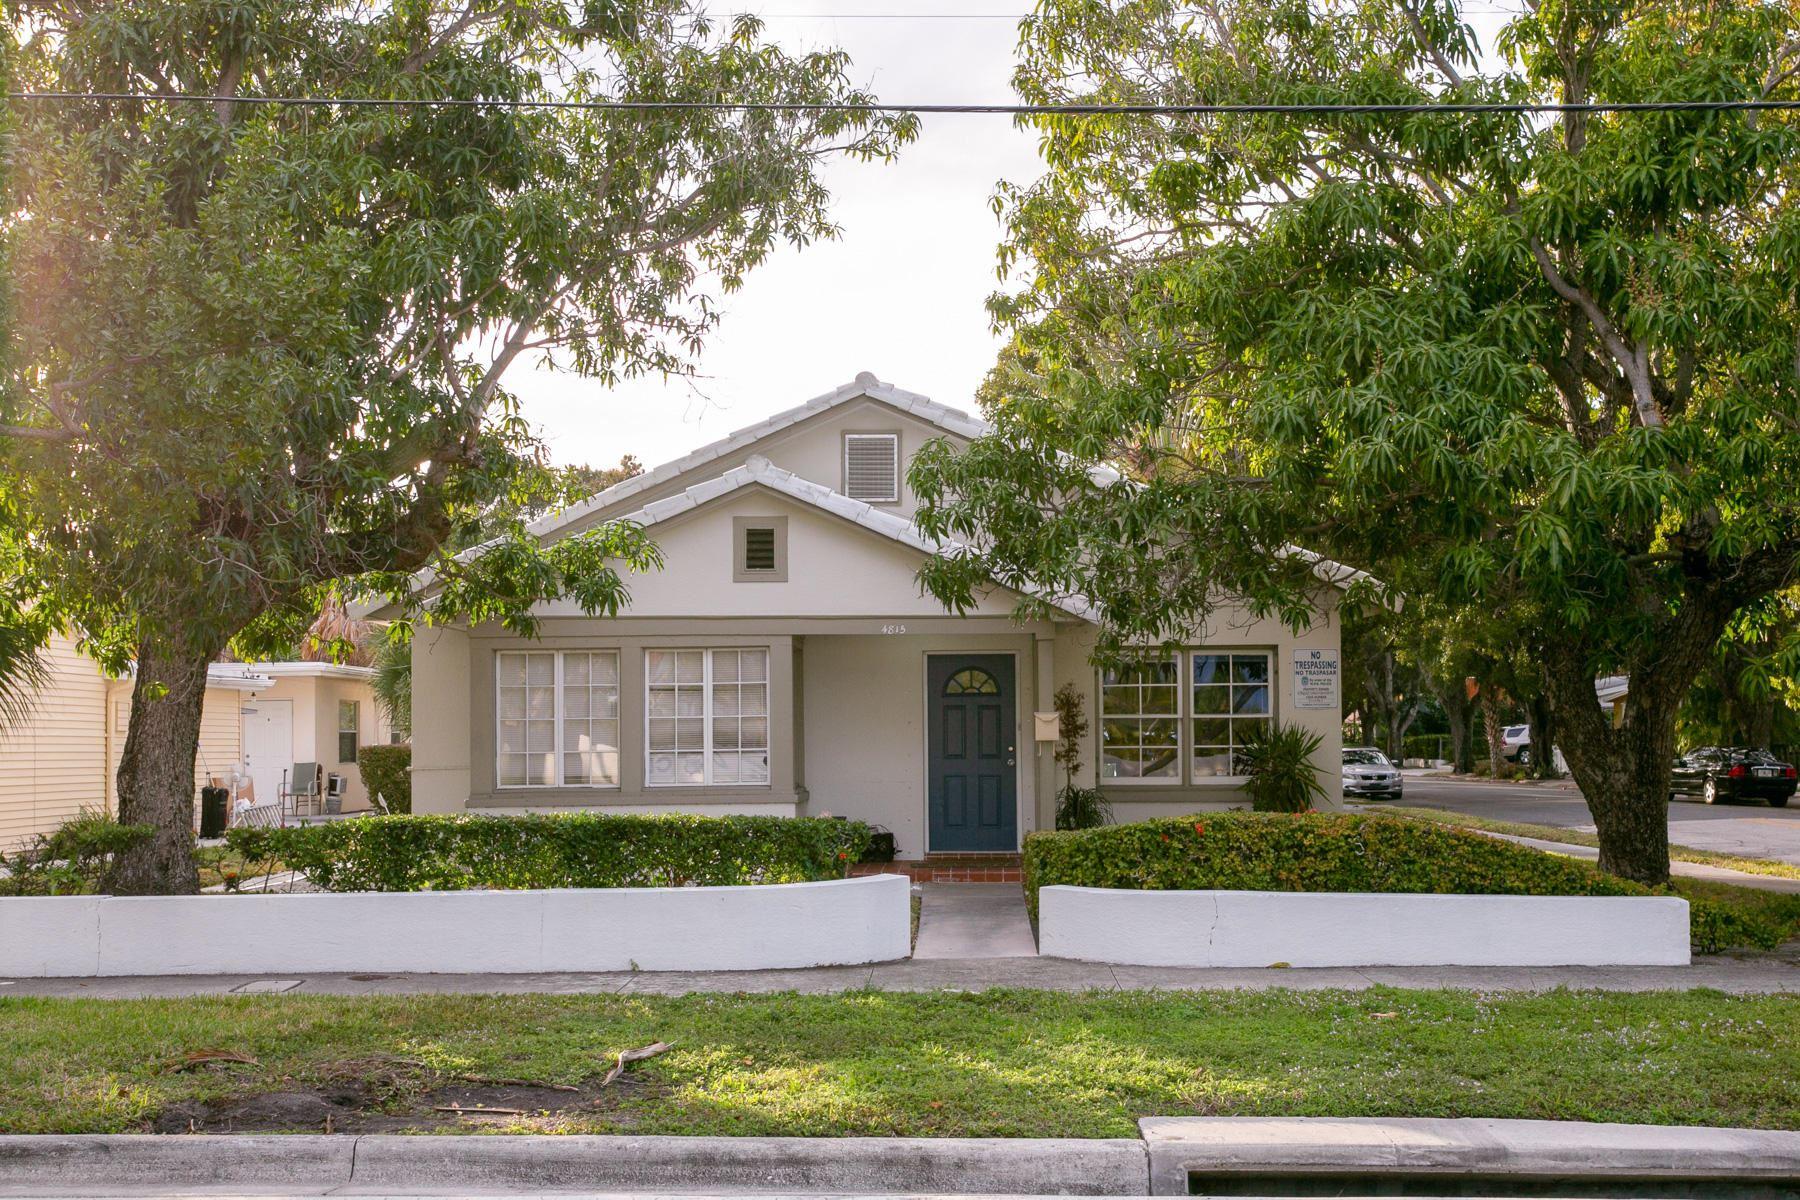 4815 N Flagler Drive, West Palm Beach, FL 33407 - #: RX-10584068